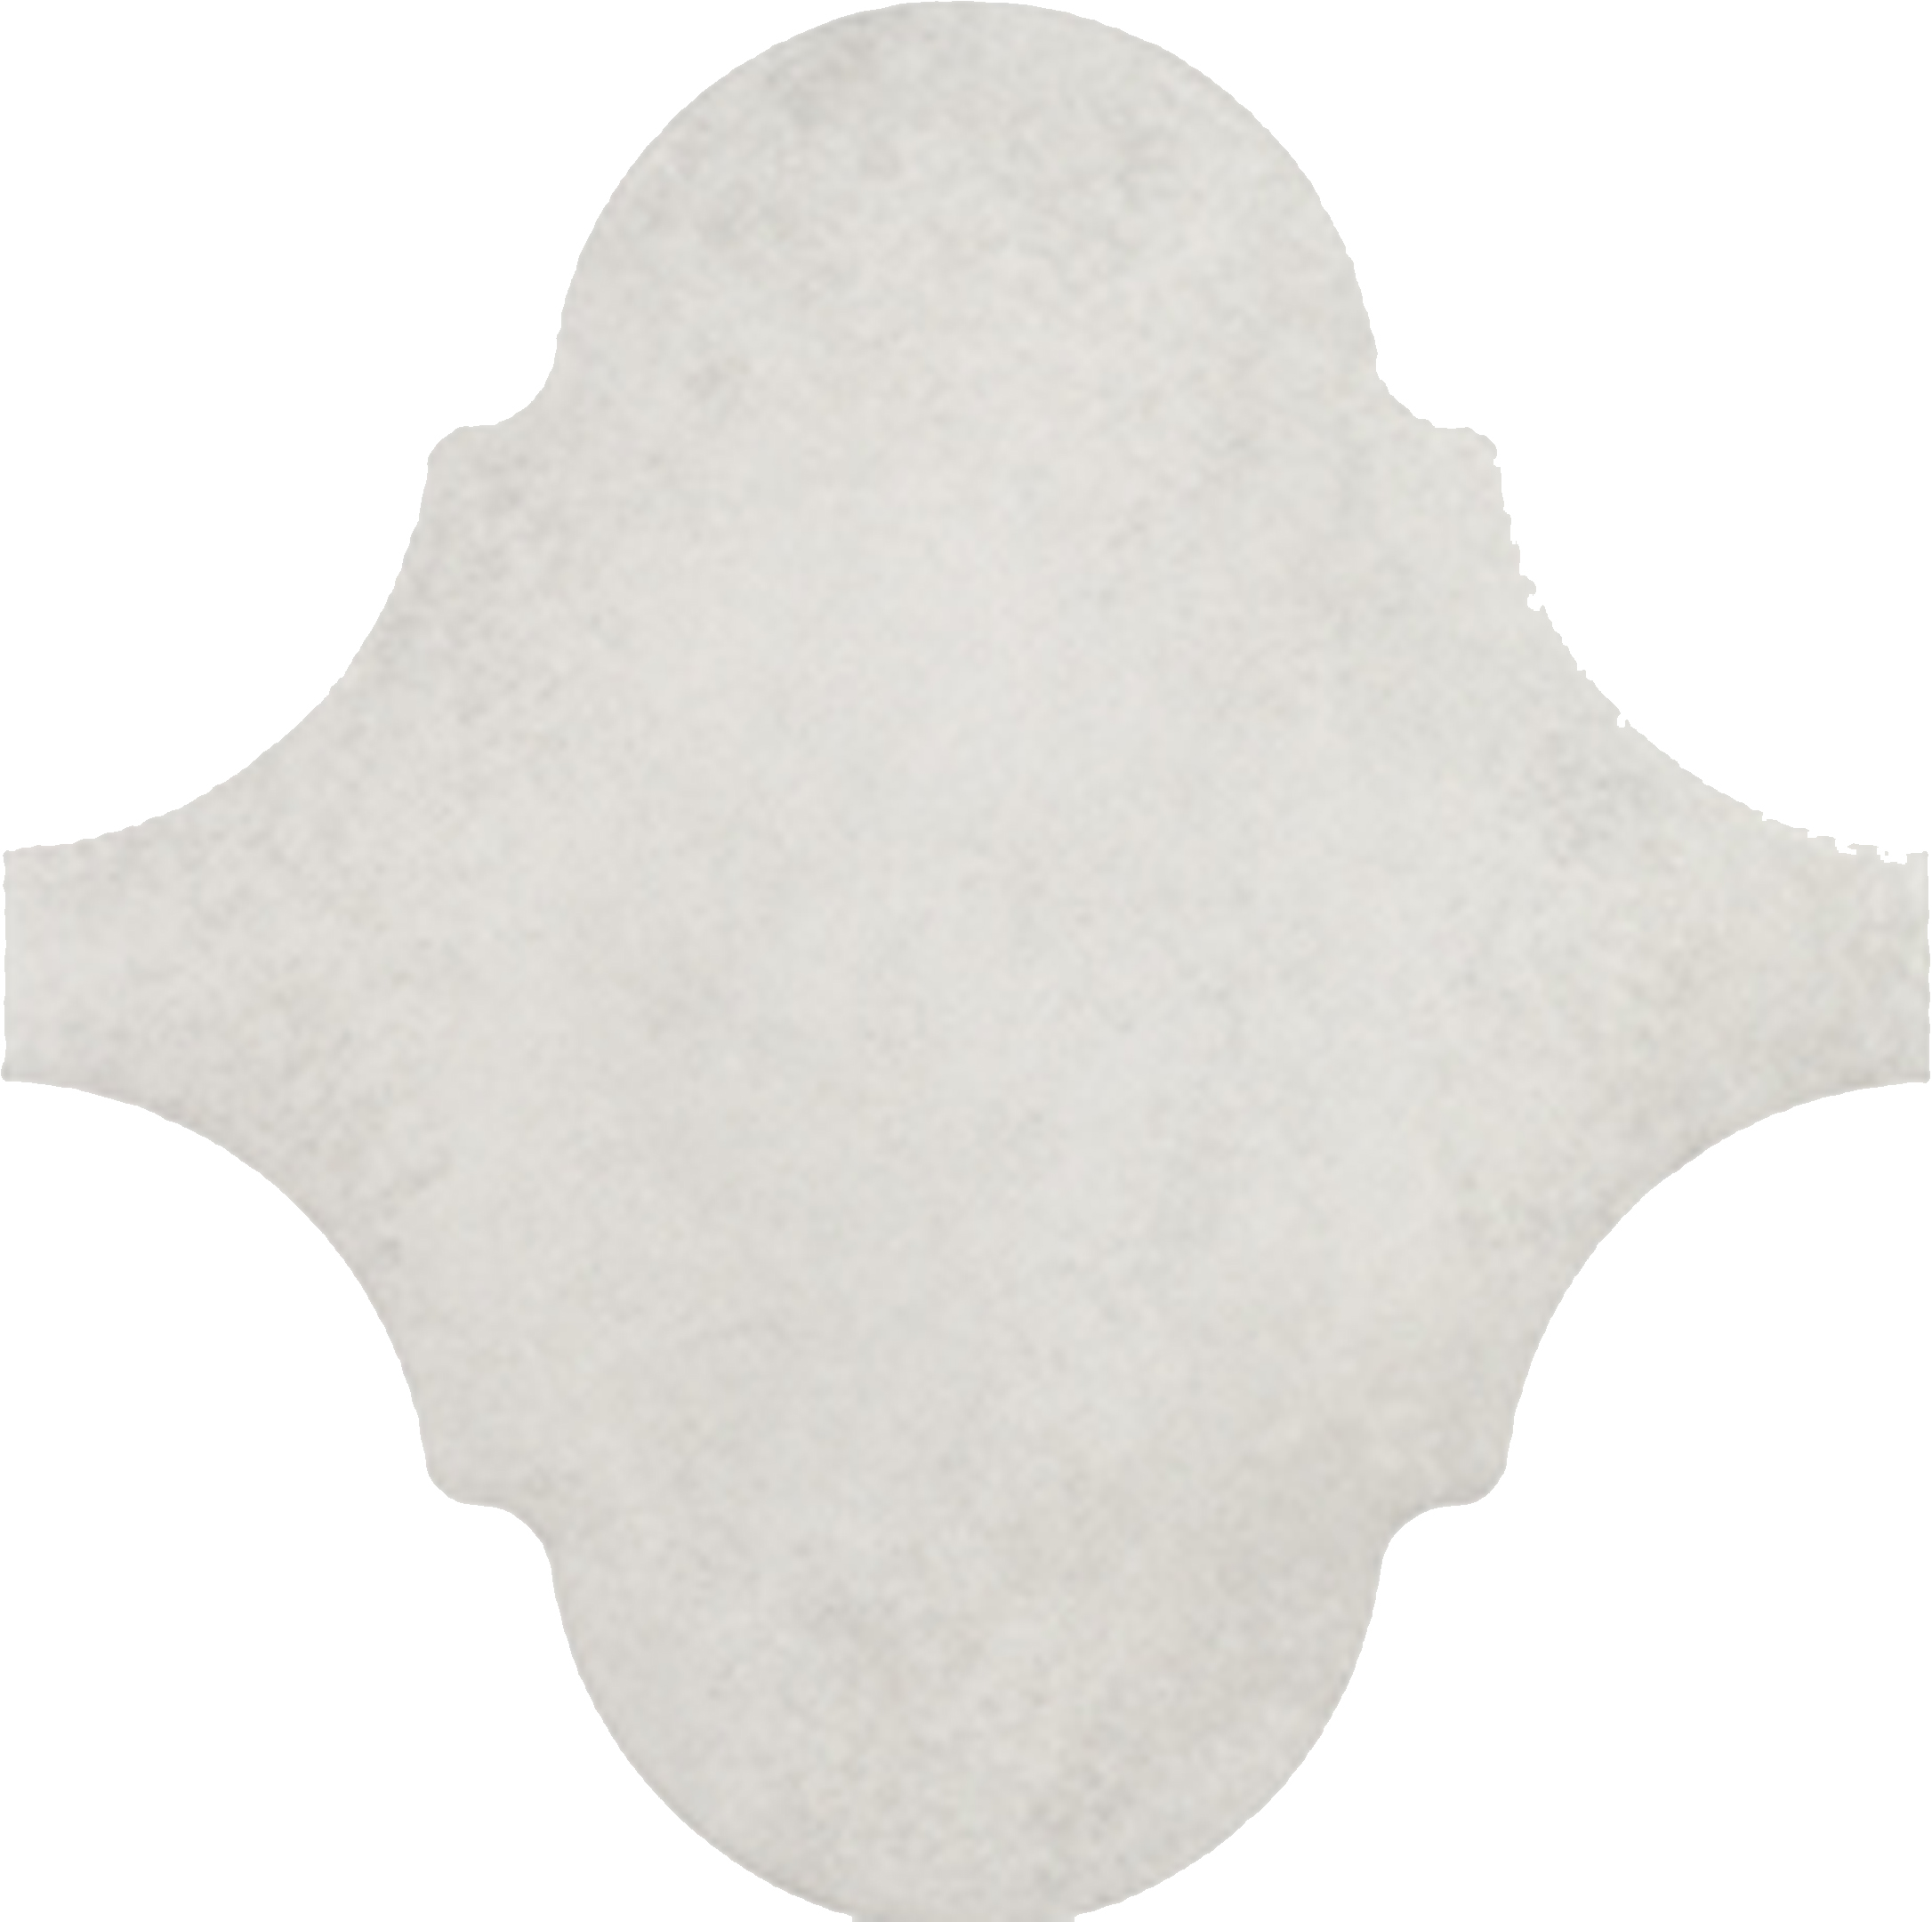 Curvytile Factory White 26.5x26.5 cm